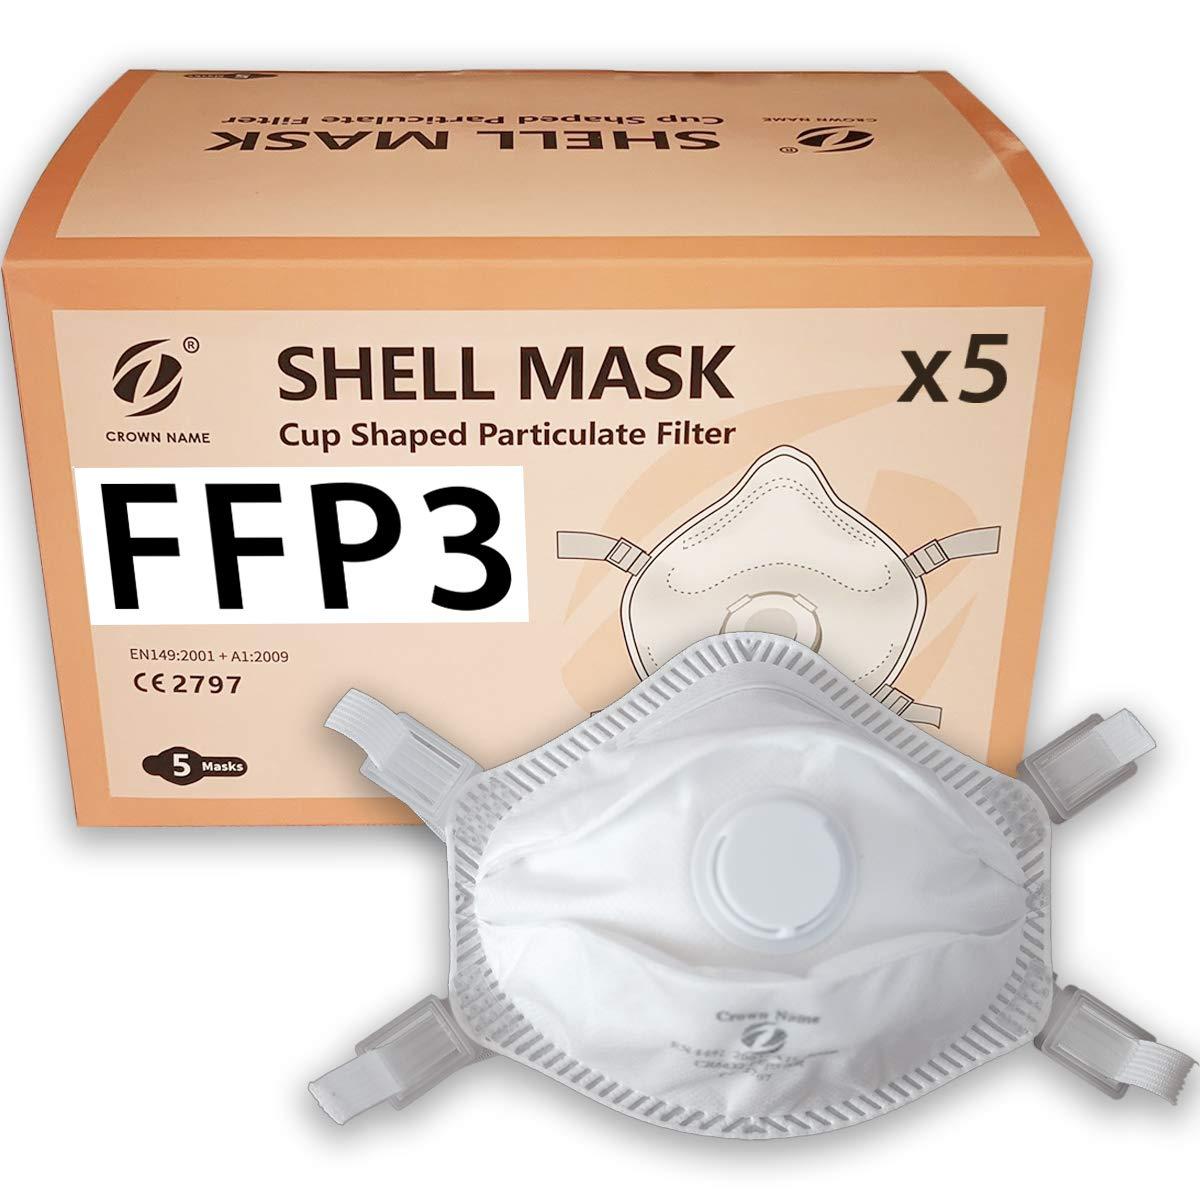 5x mascarillas de respiración FFP3, mascarillas de protección facial con válvula, certificado CE, paquete de 5 mascarillas